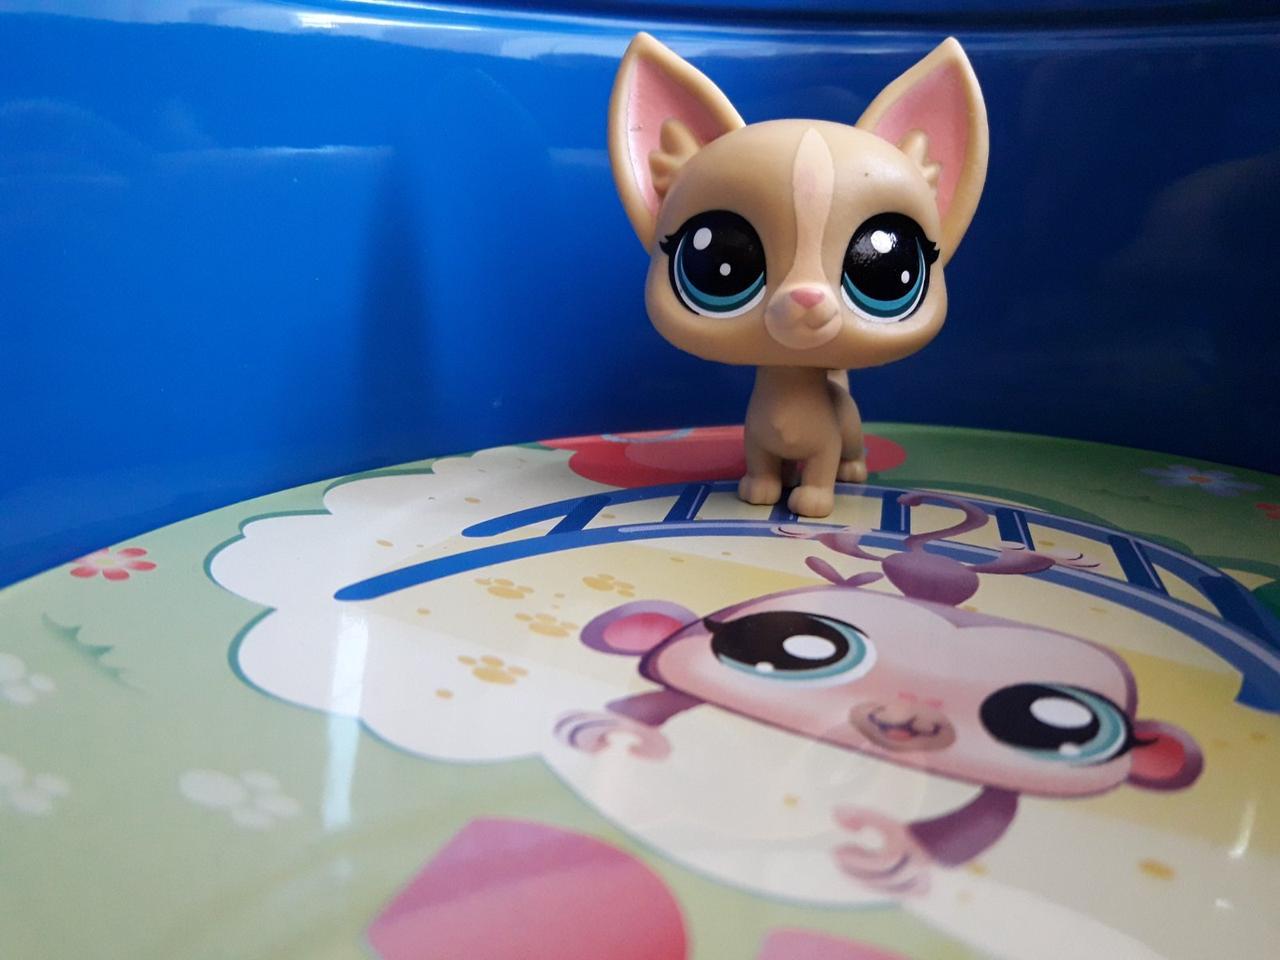 Littlest pet shop lps игрушка Hasbro лпс пет шоп собачка poco la playa